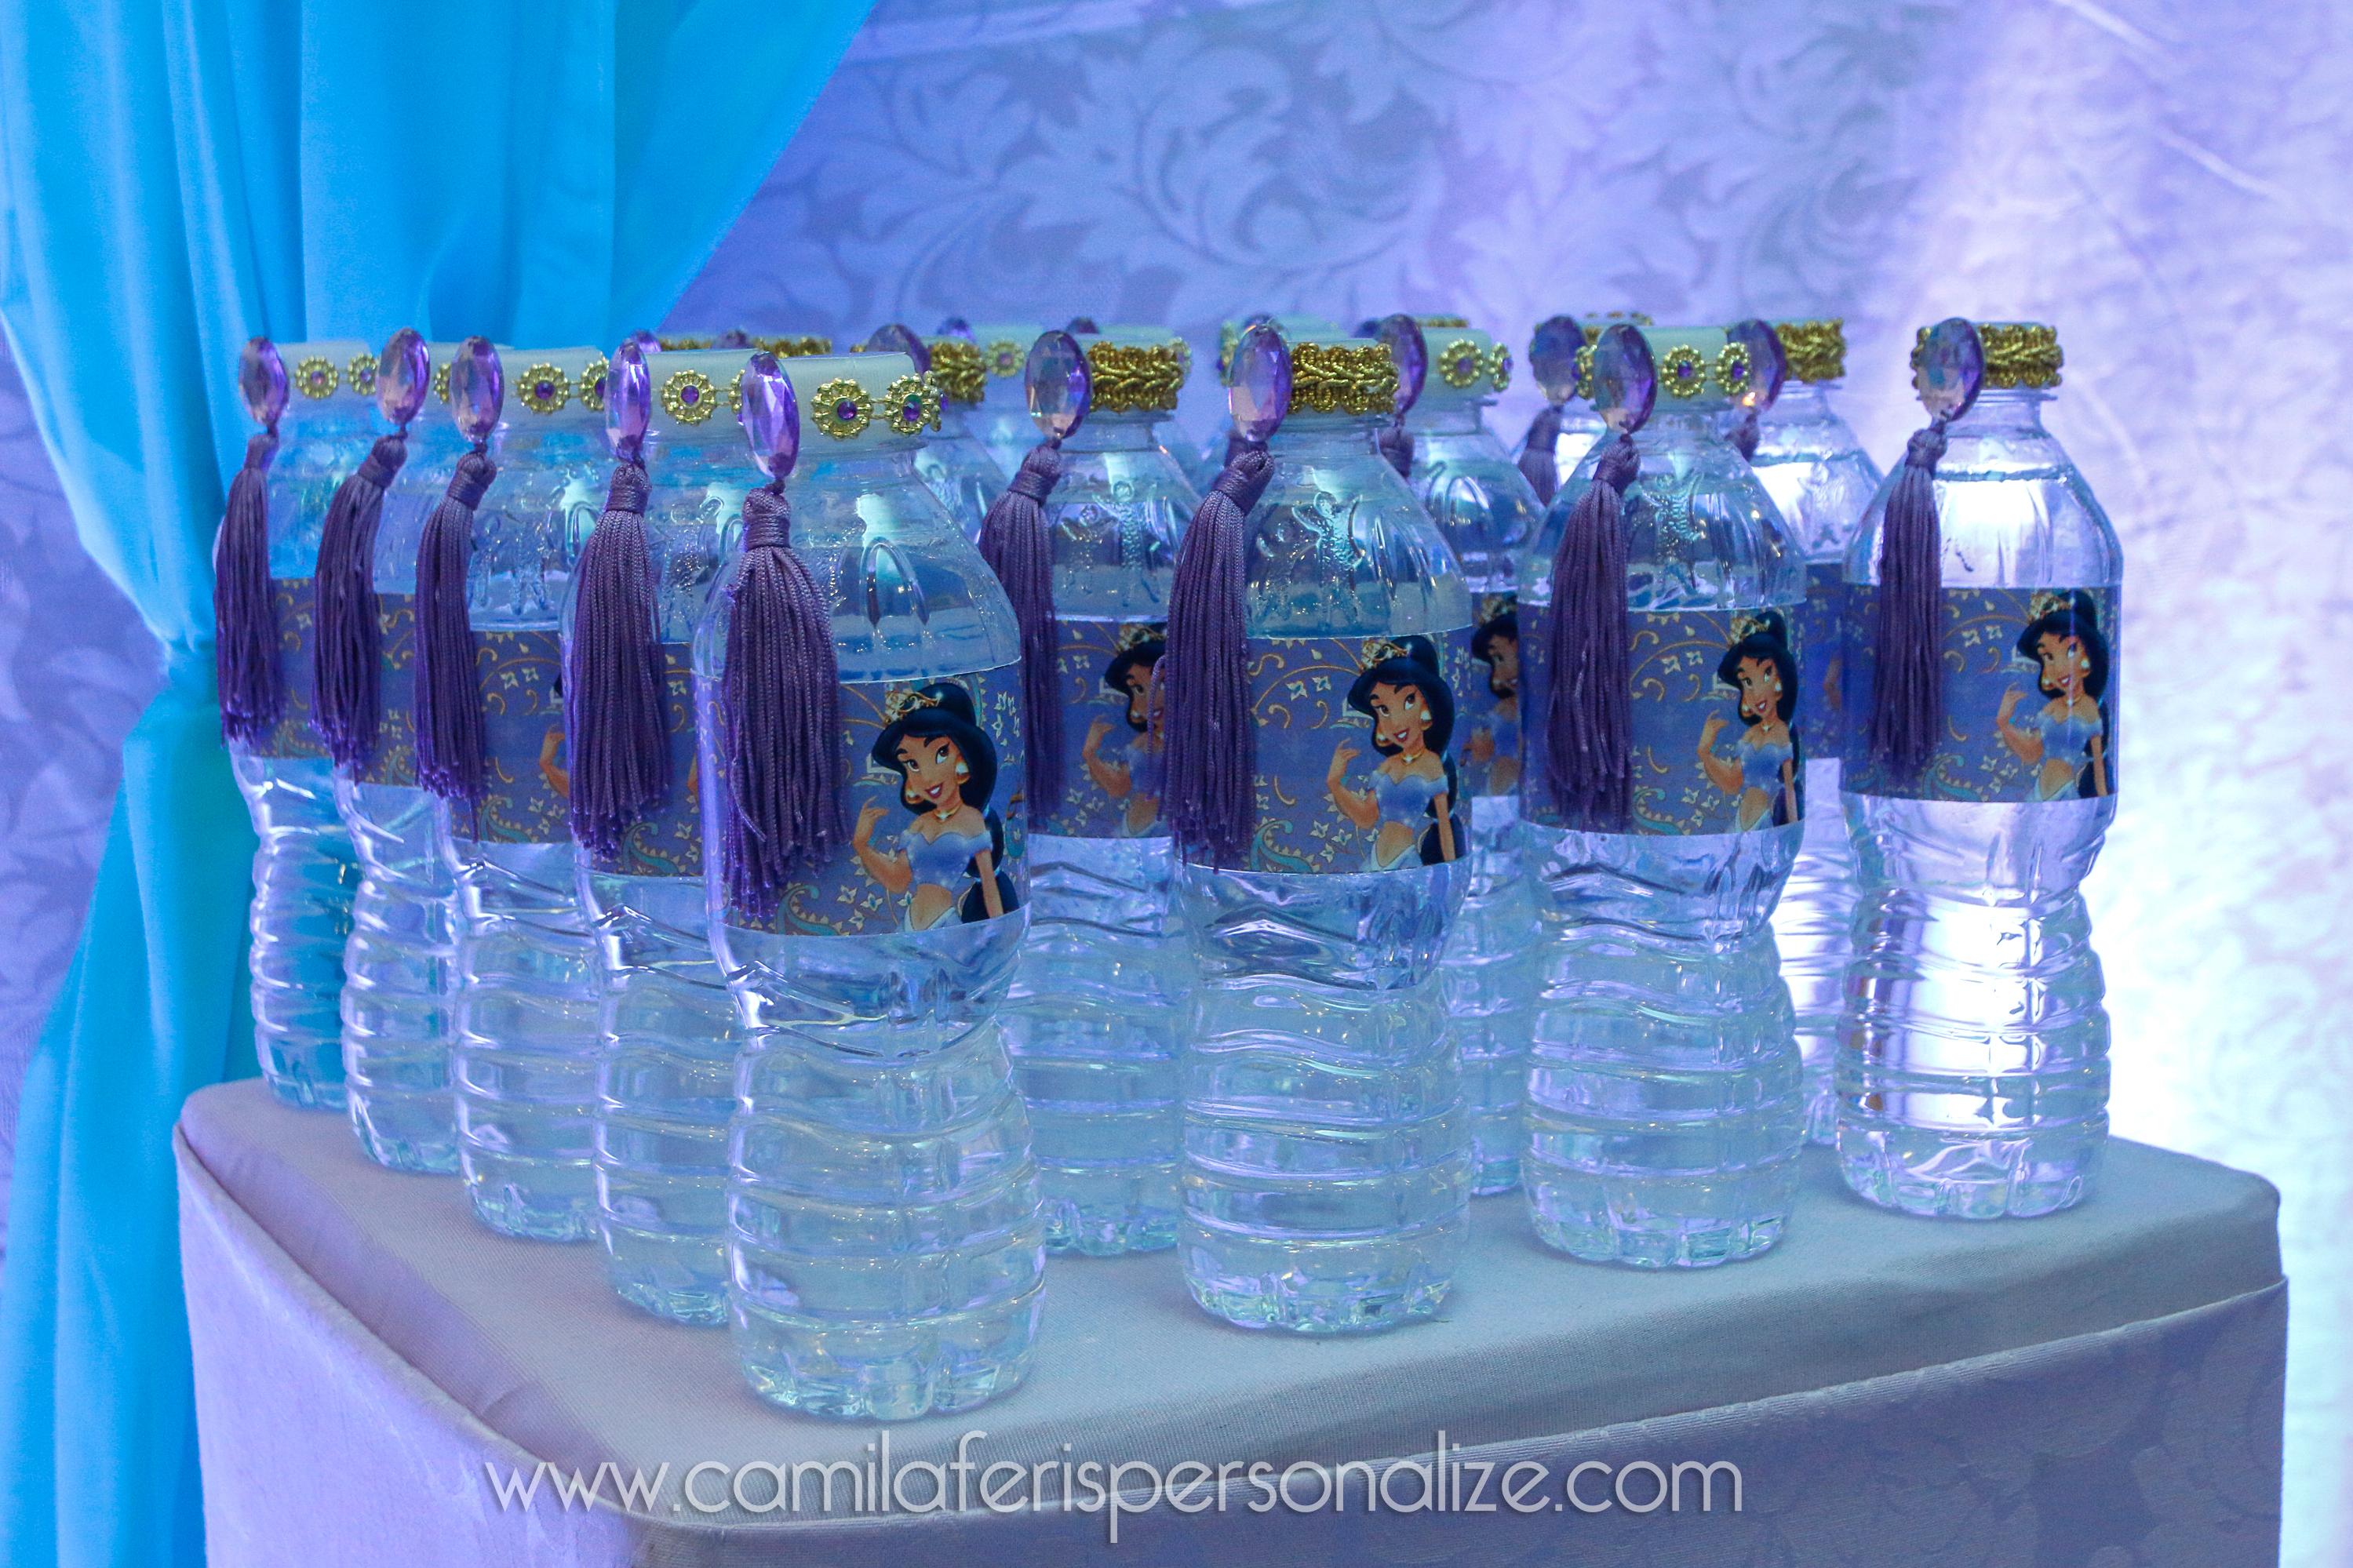 agua personalizada jasmine.jpg